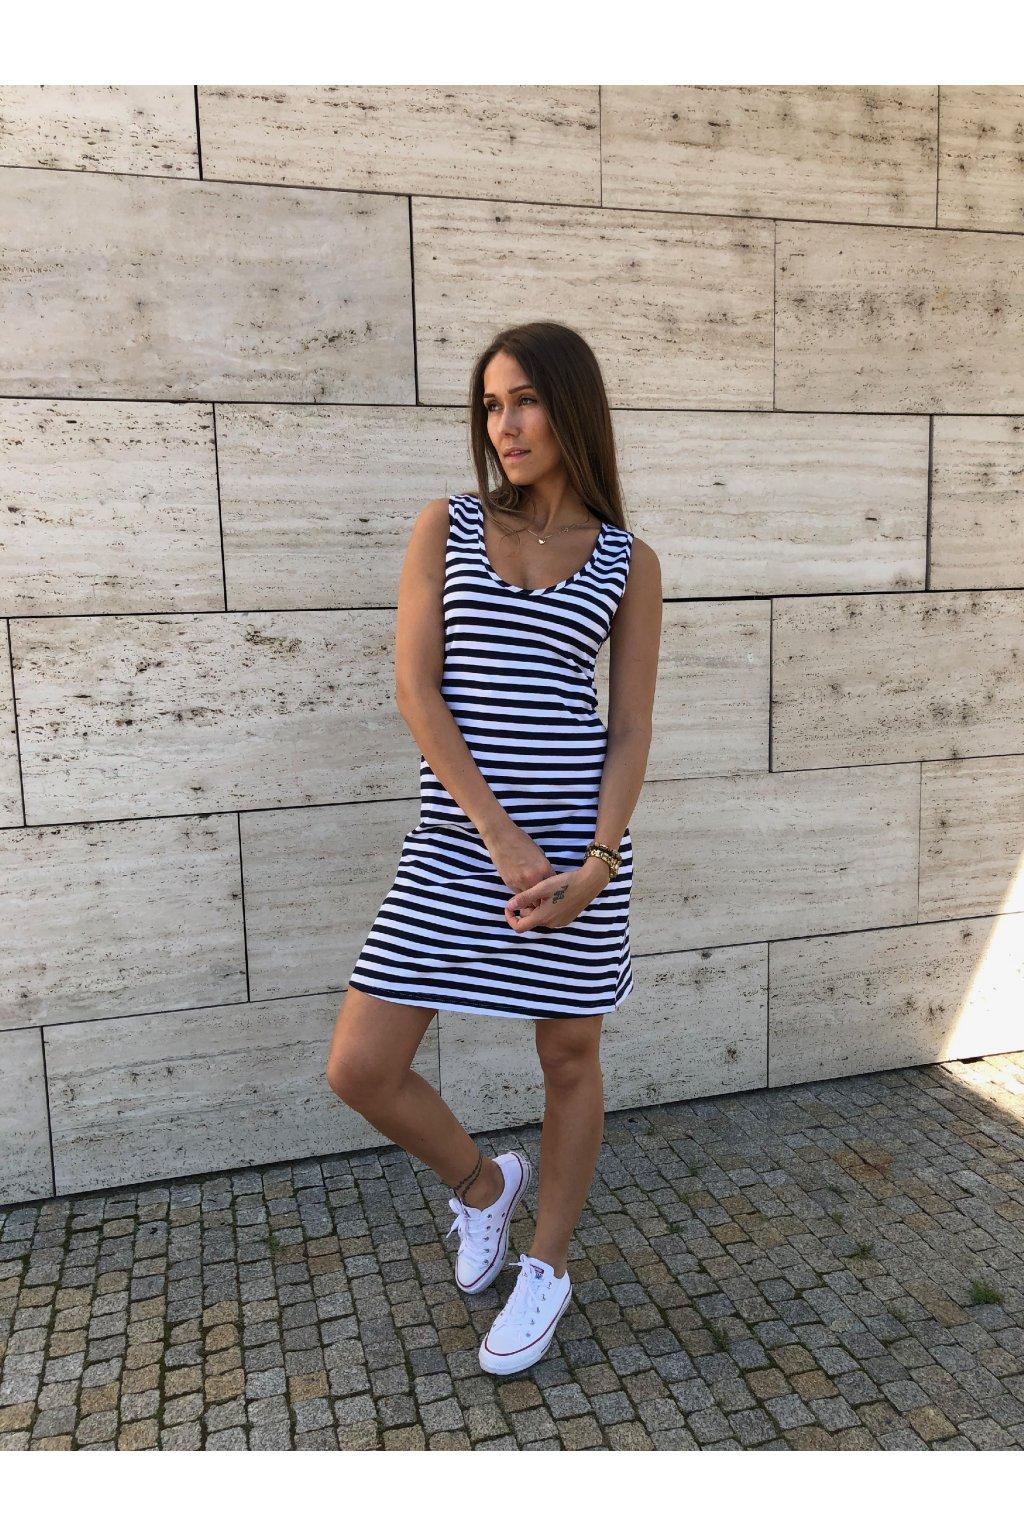 damske saty sport stripe navy eshopat cz 1